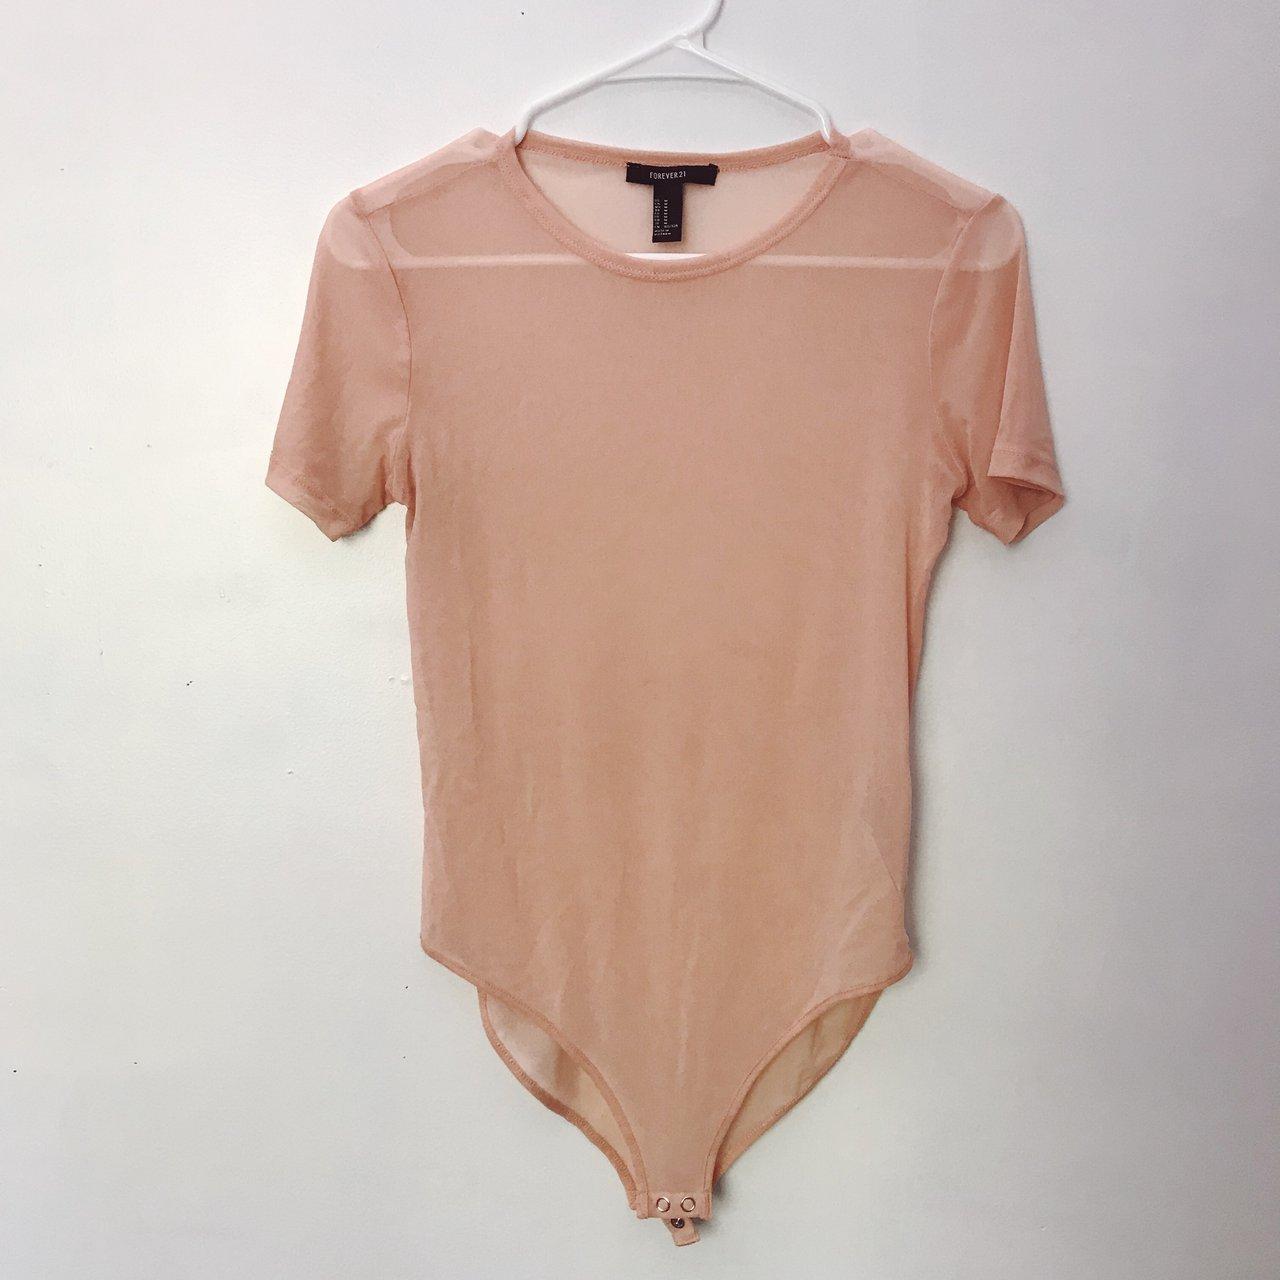 nude mesh bodysuit, second hand on $9 on depop